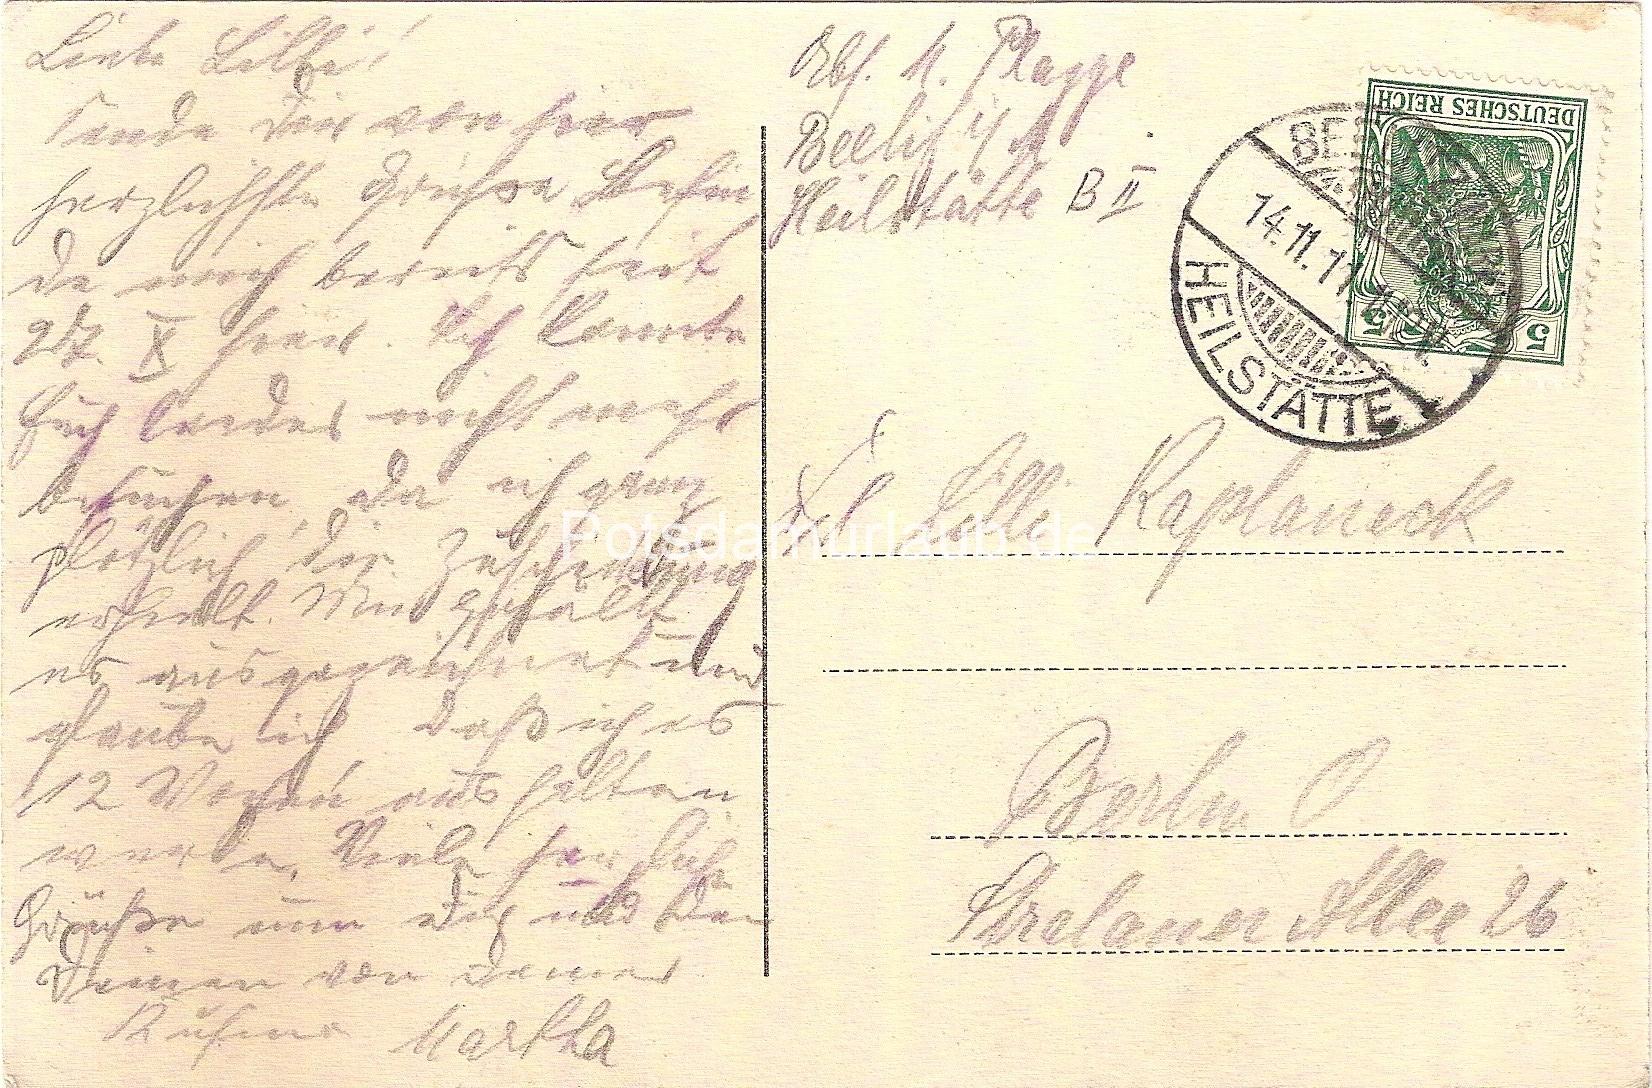 1911 11 14 v0002